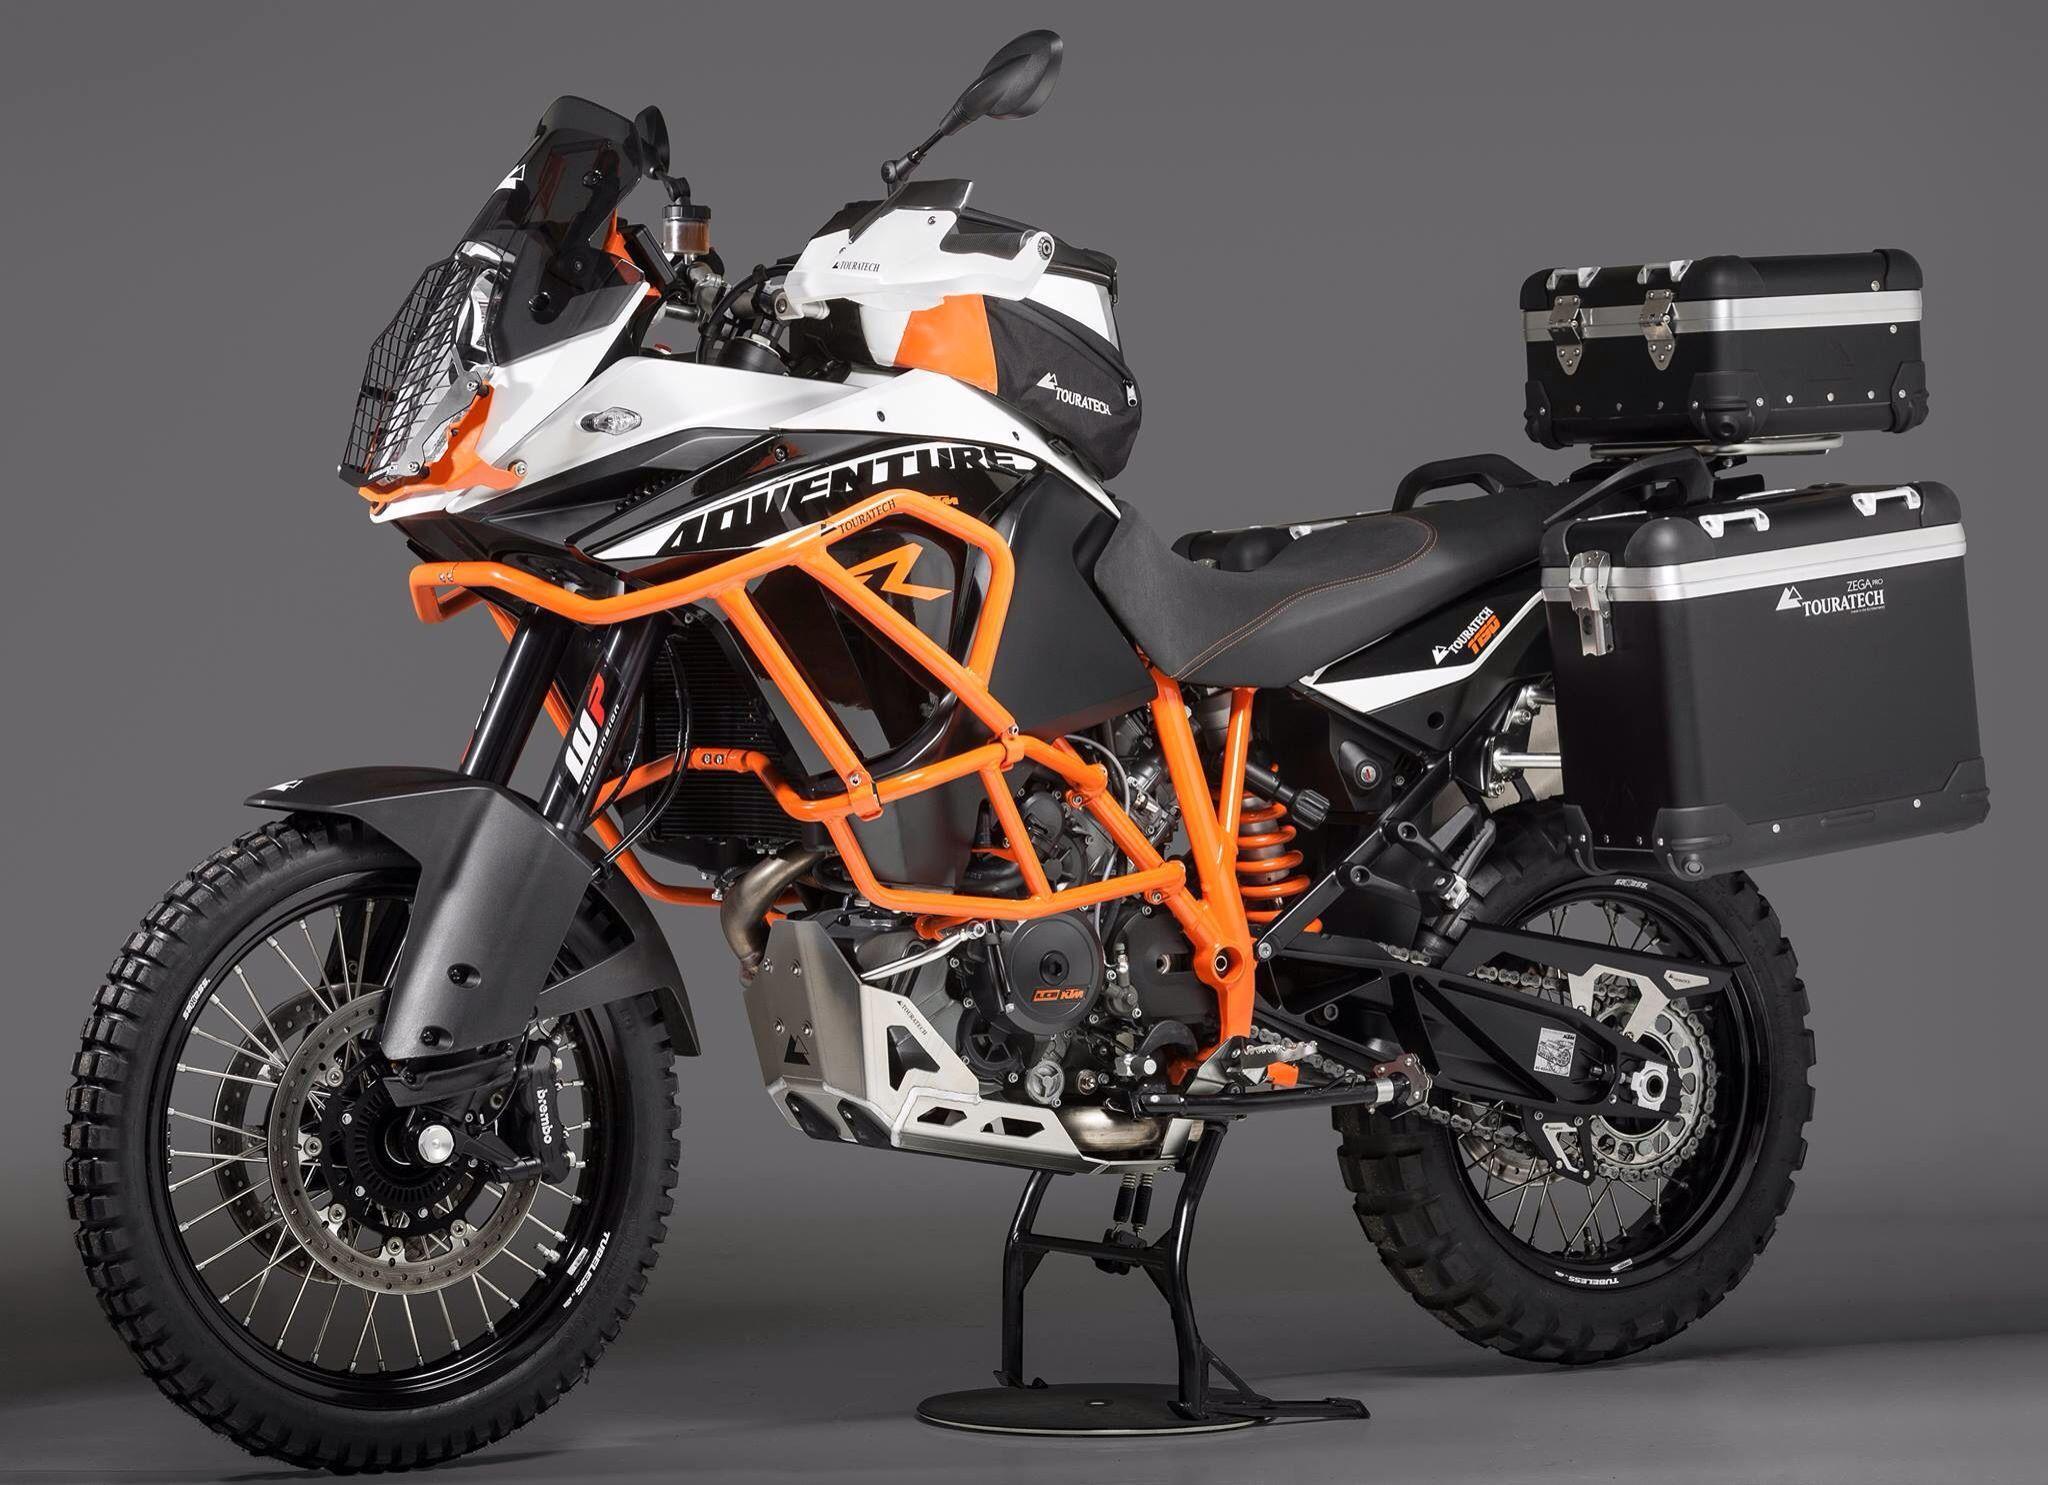 Ktm Stuffed Their 180 Hp Motor Into A Adventure Bike 155 Mph